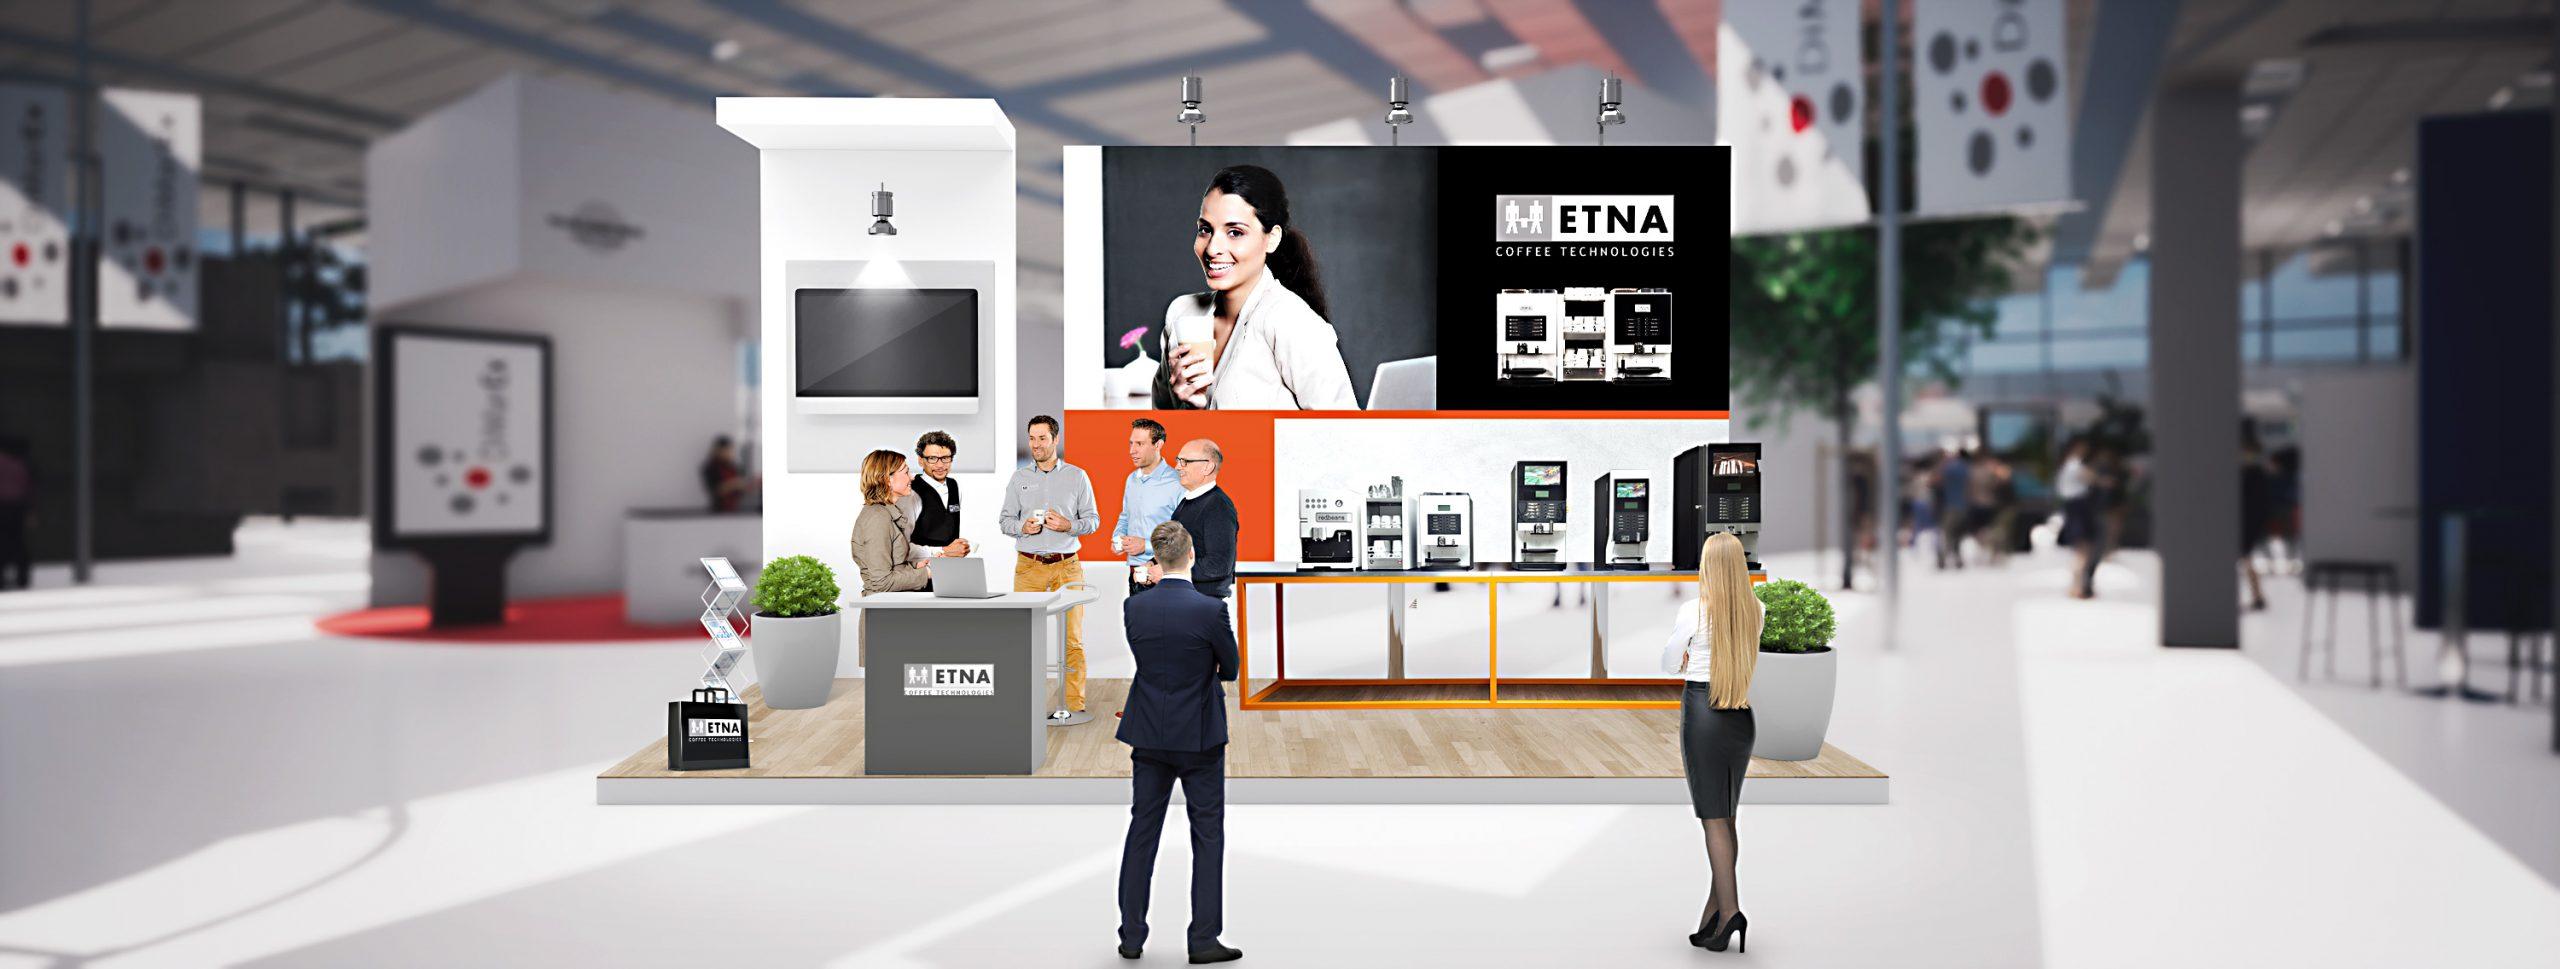 Etna Vendtra Vending Trade Festival Deutschland